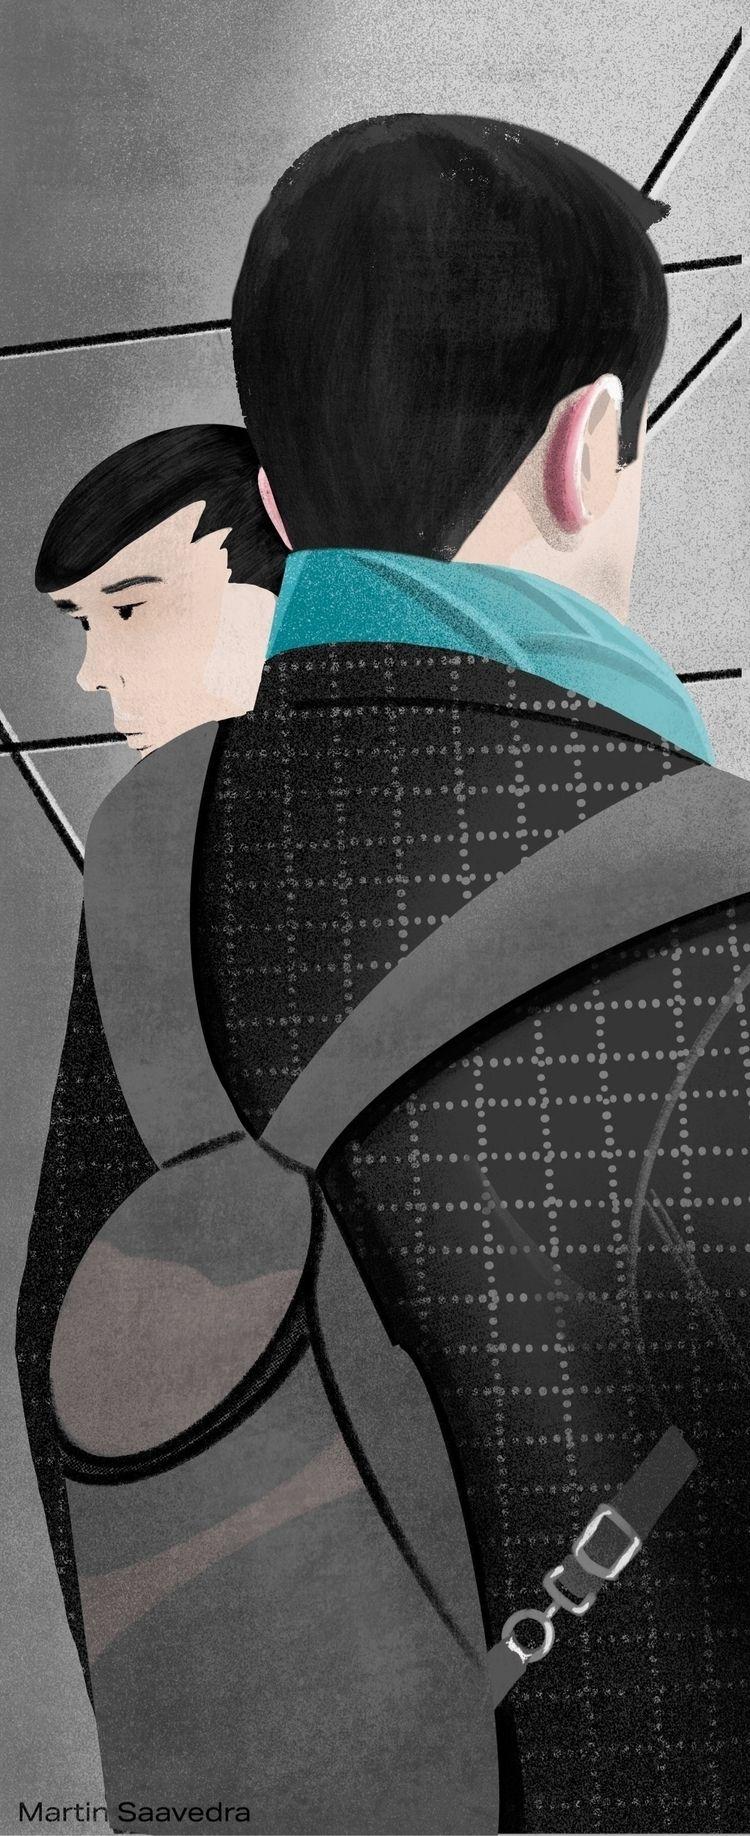 rushhour, metrodc, metro, illustration - martinillustrates | ello